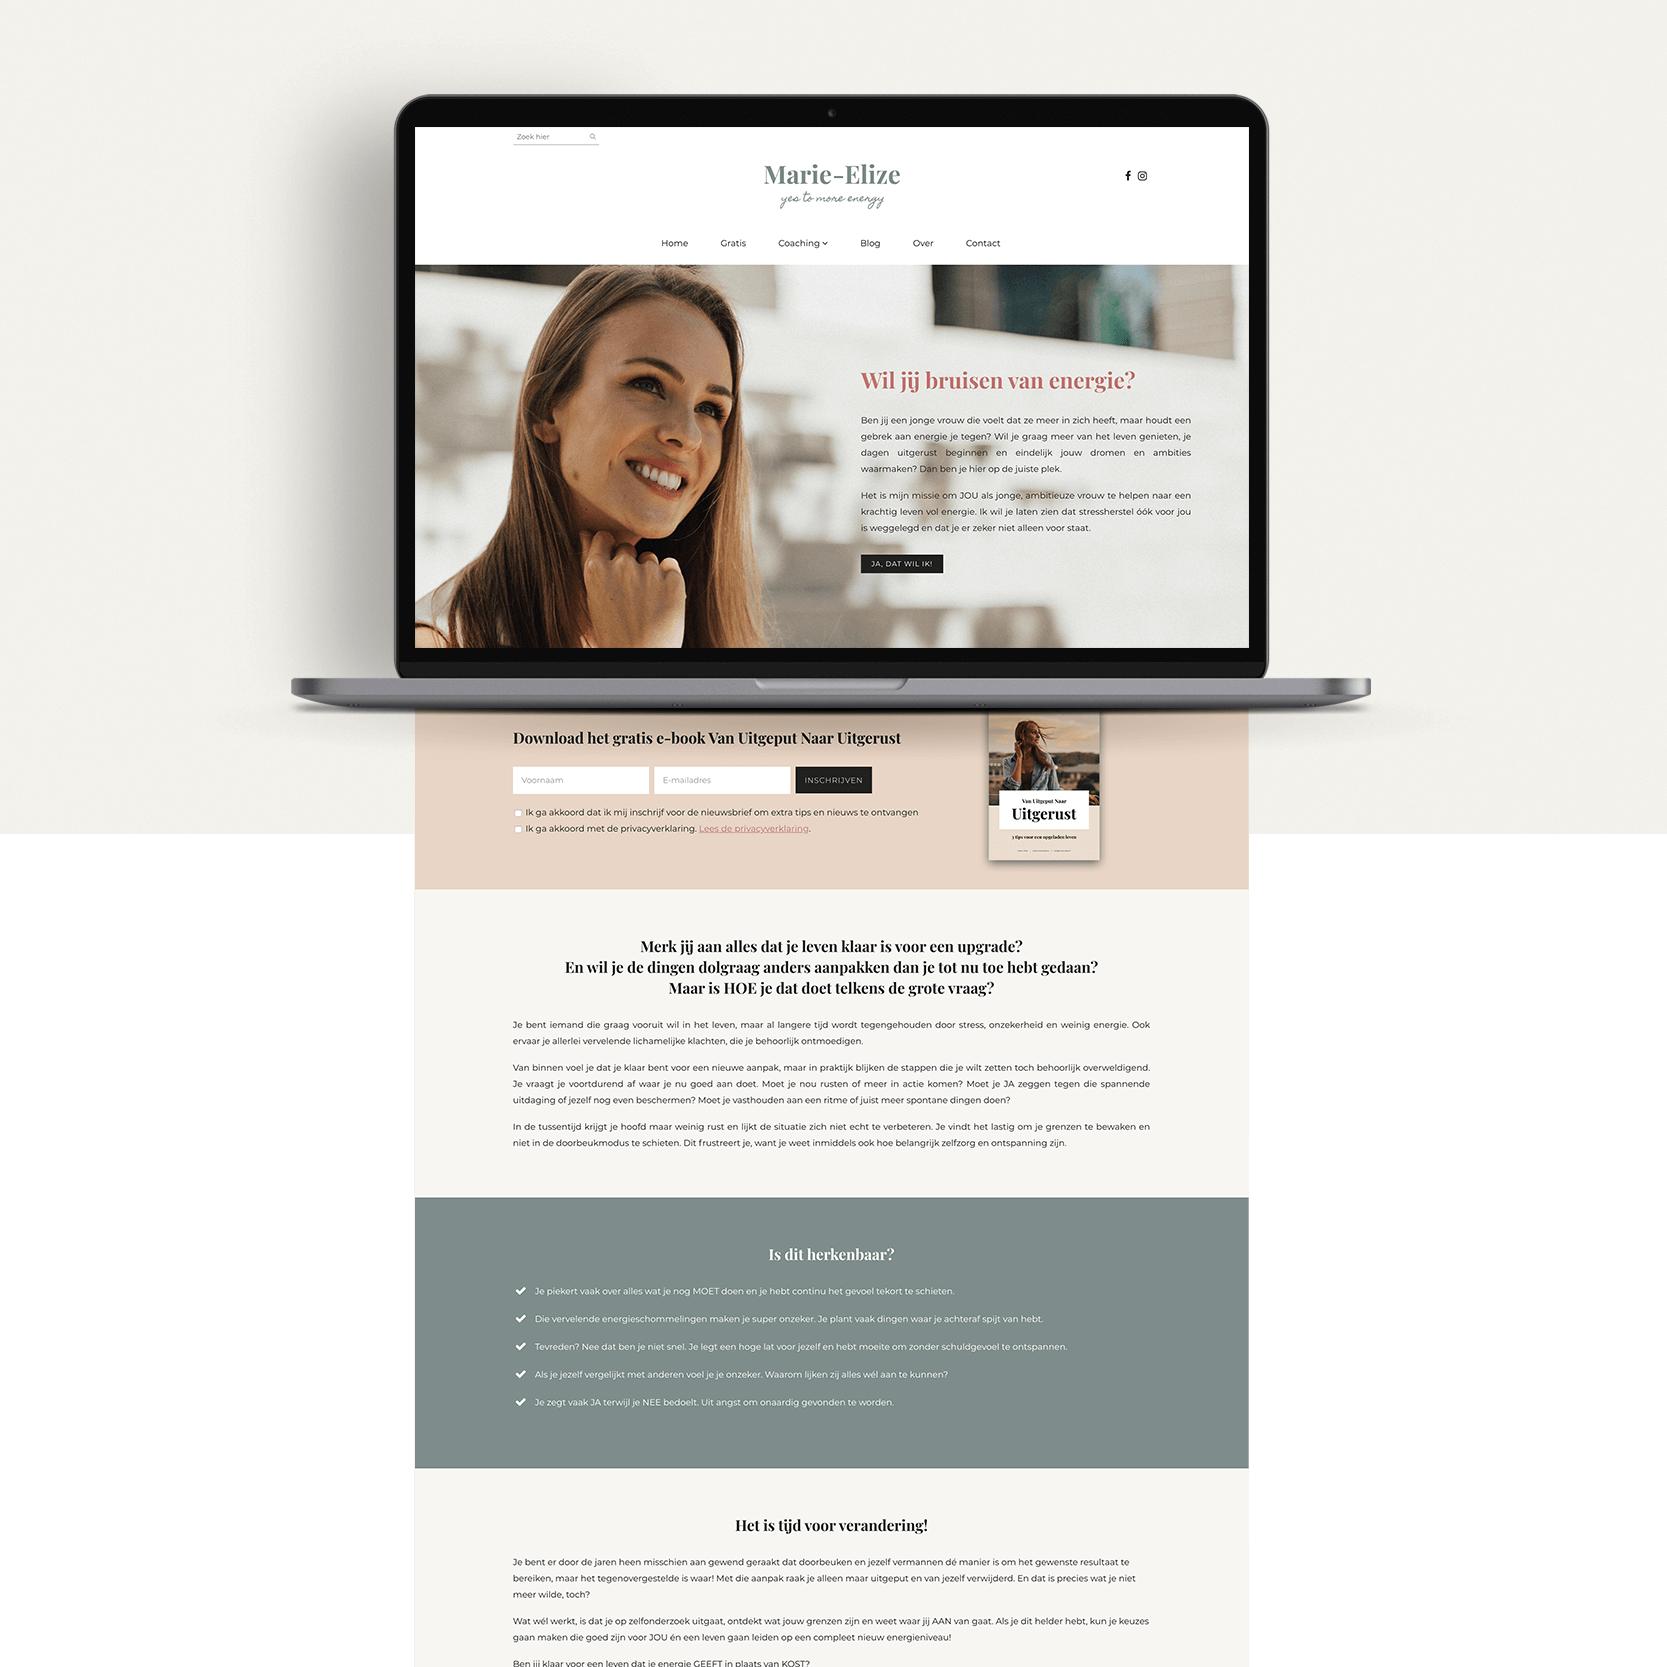 Webdesign - Marie-Elize | Eunoia Studio